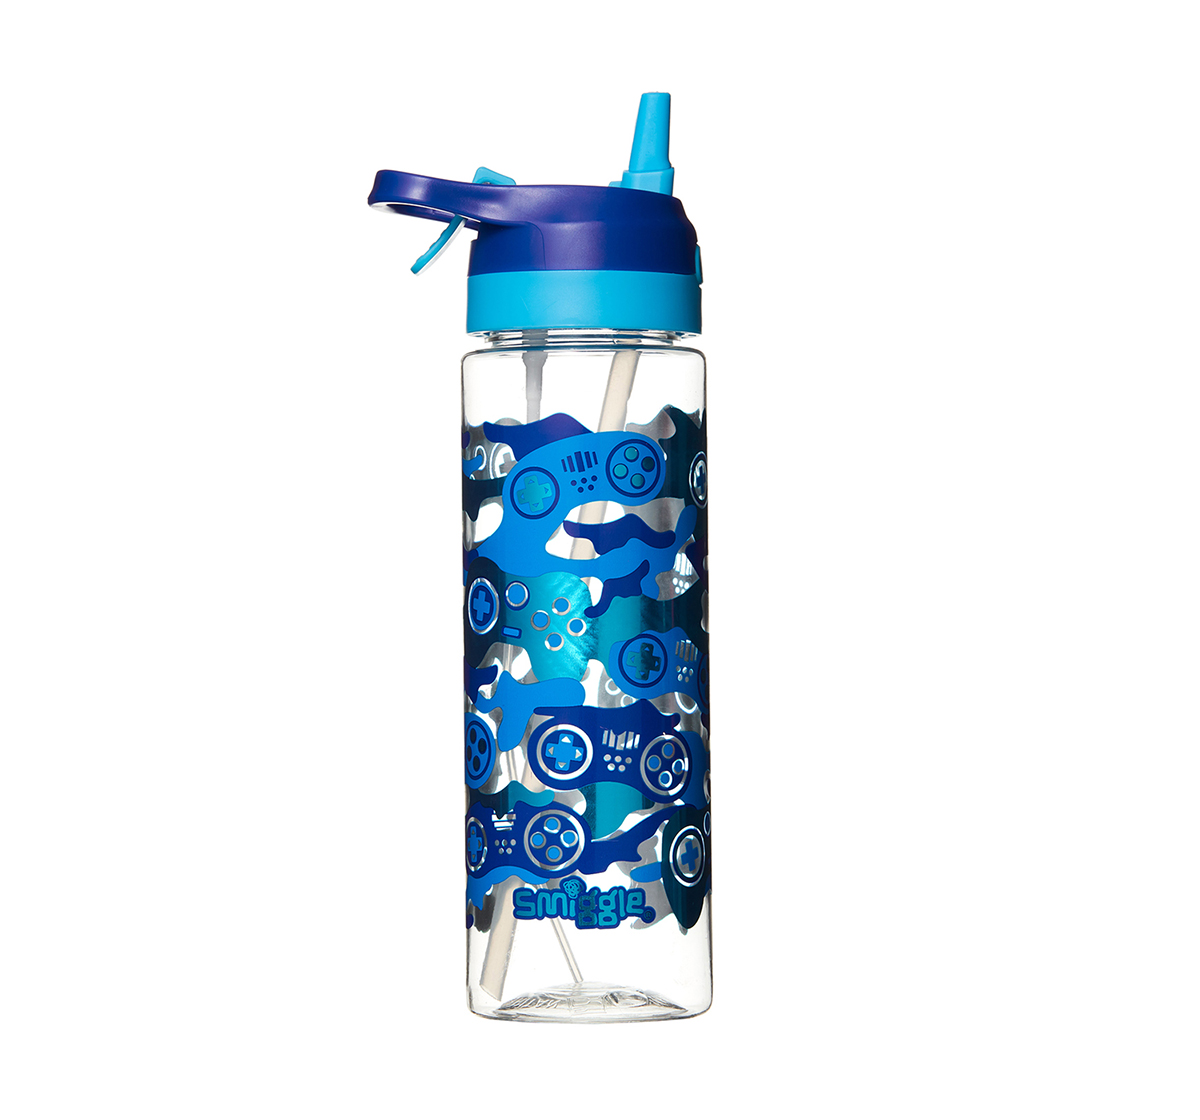 Smiggle | Smiggle Viva Spritz Bottle with Misting Function - Gaming Print Bags for Kids age 3Y+ (Cobalt Blue)